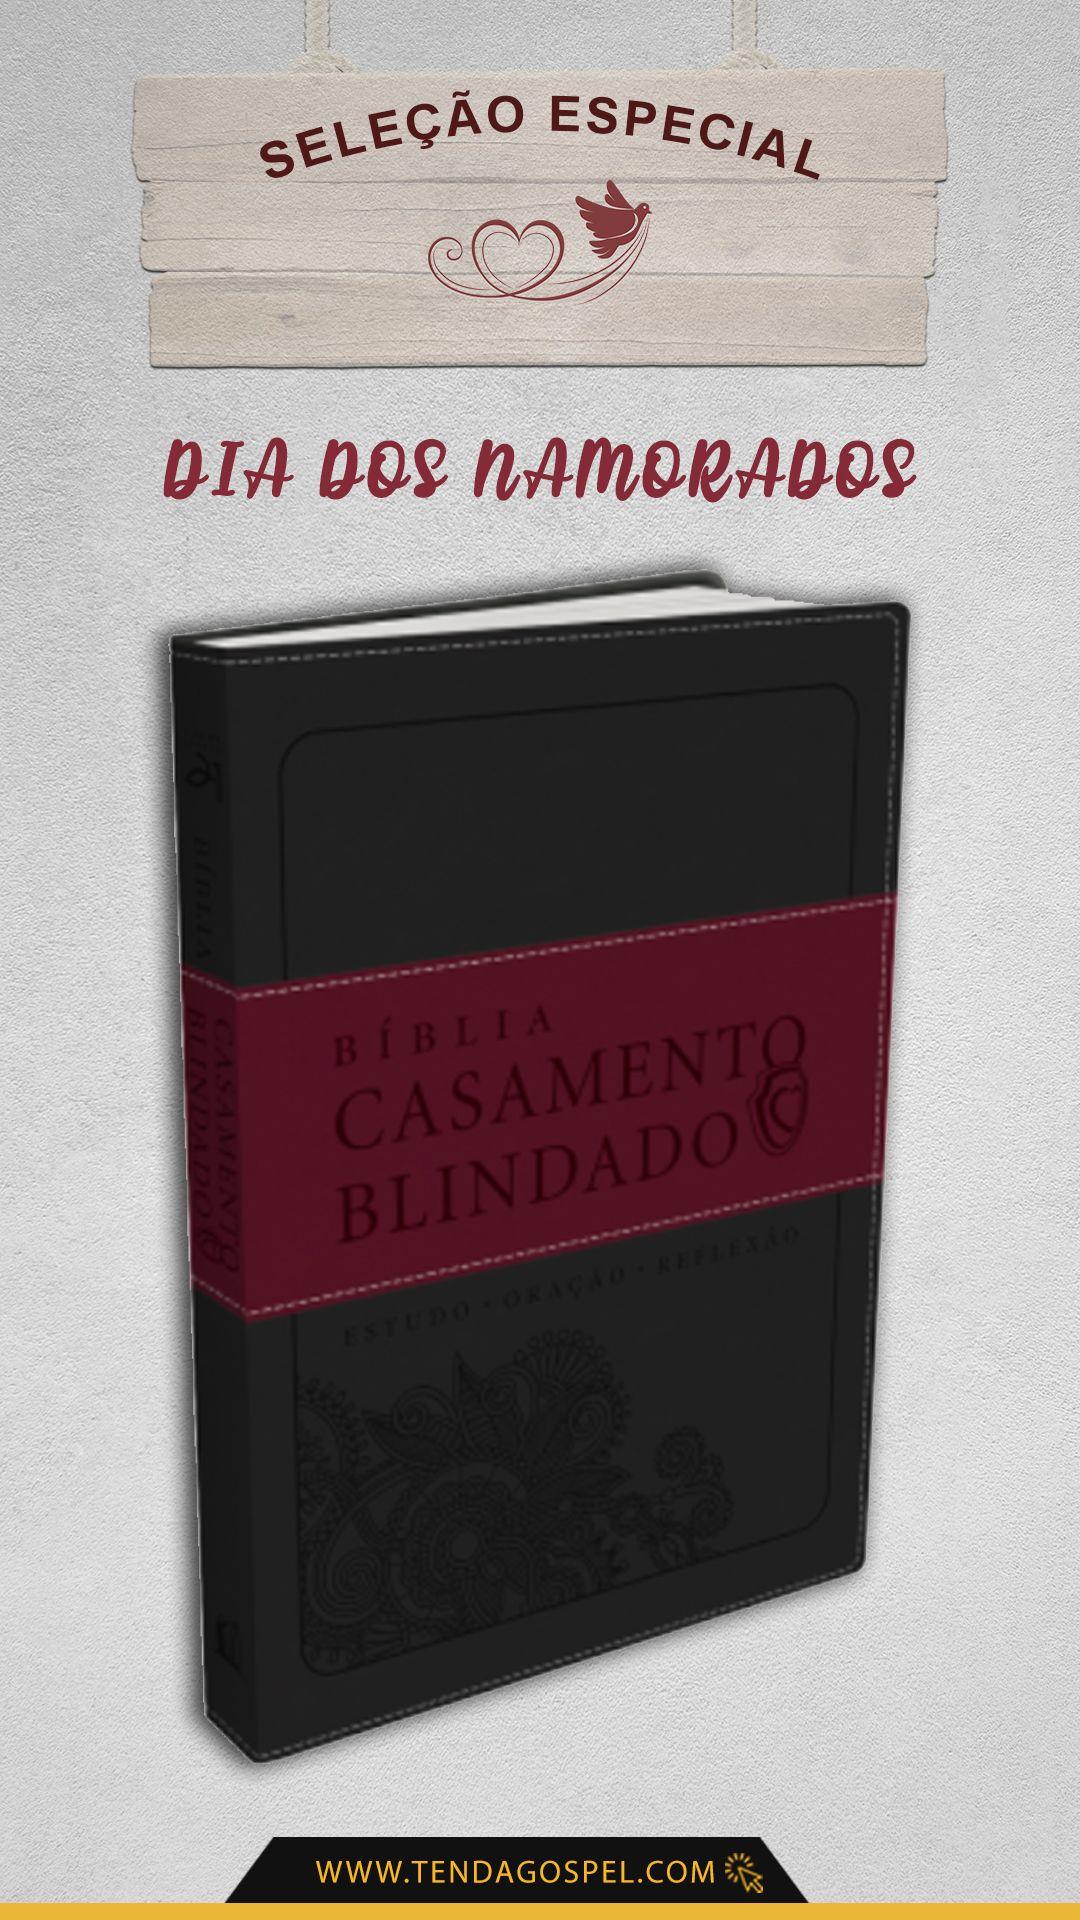 Livrariatendagospel Livraria Biblia Jesus Deusnocomando